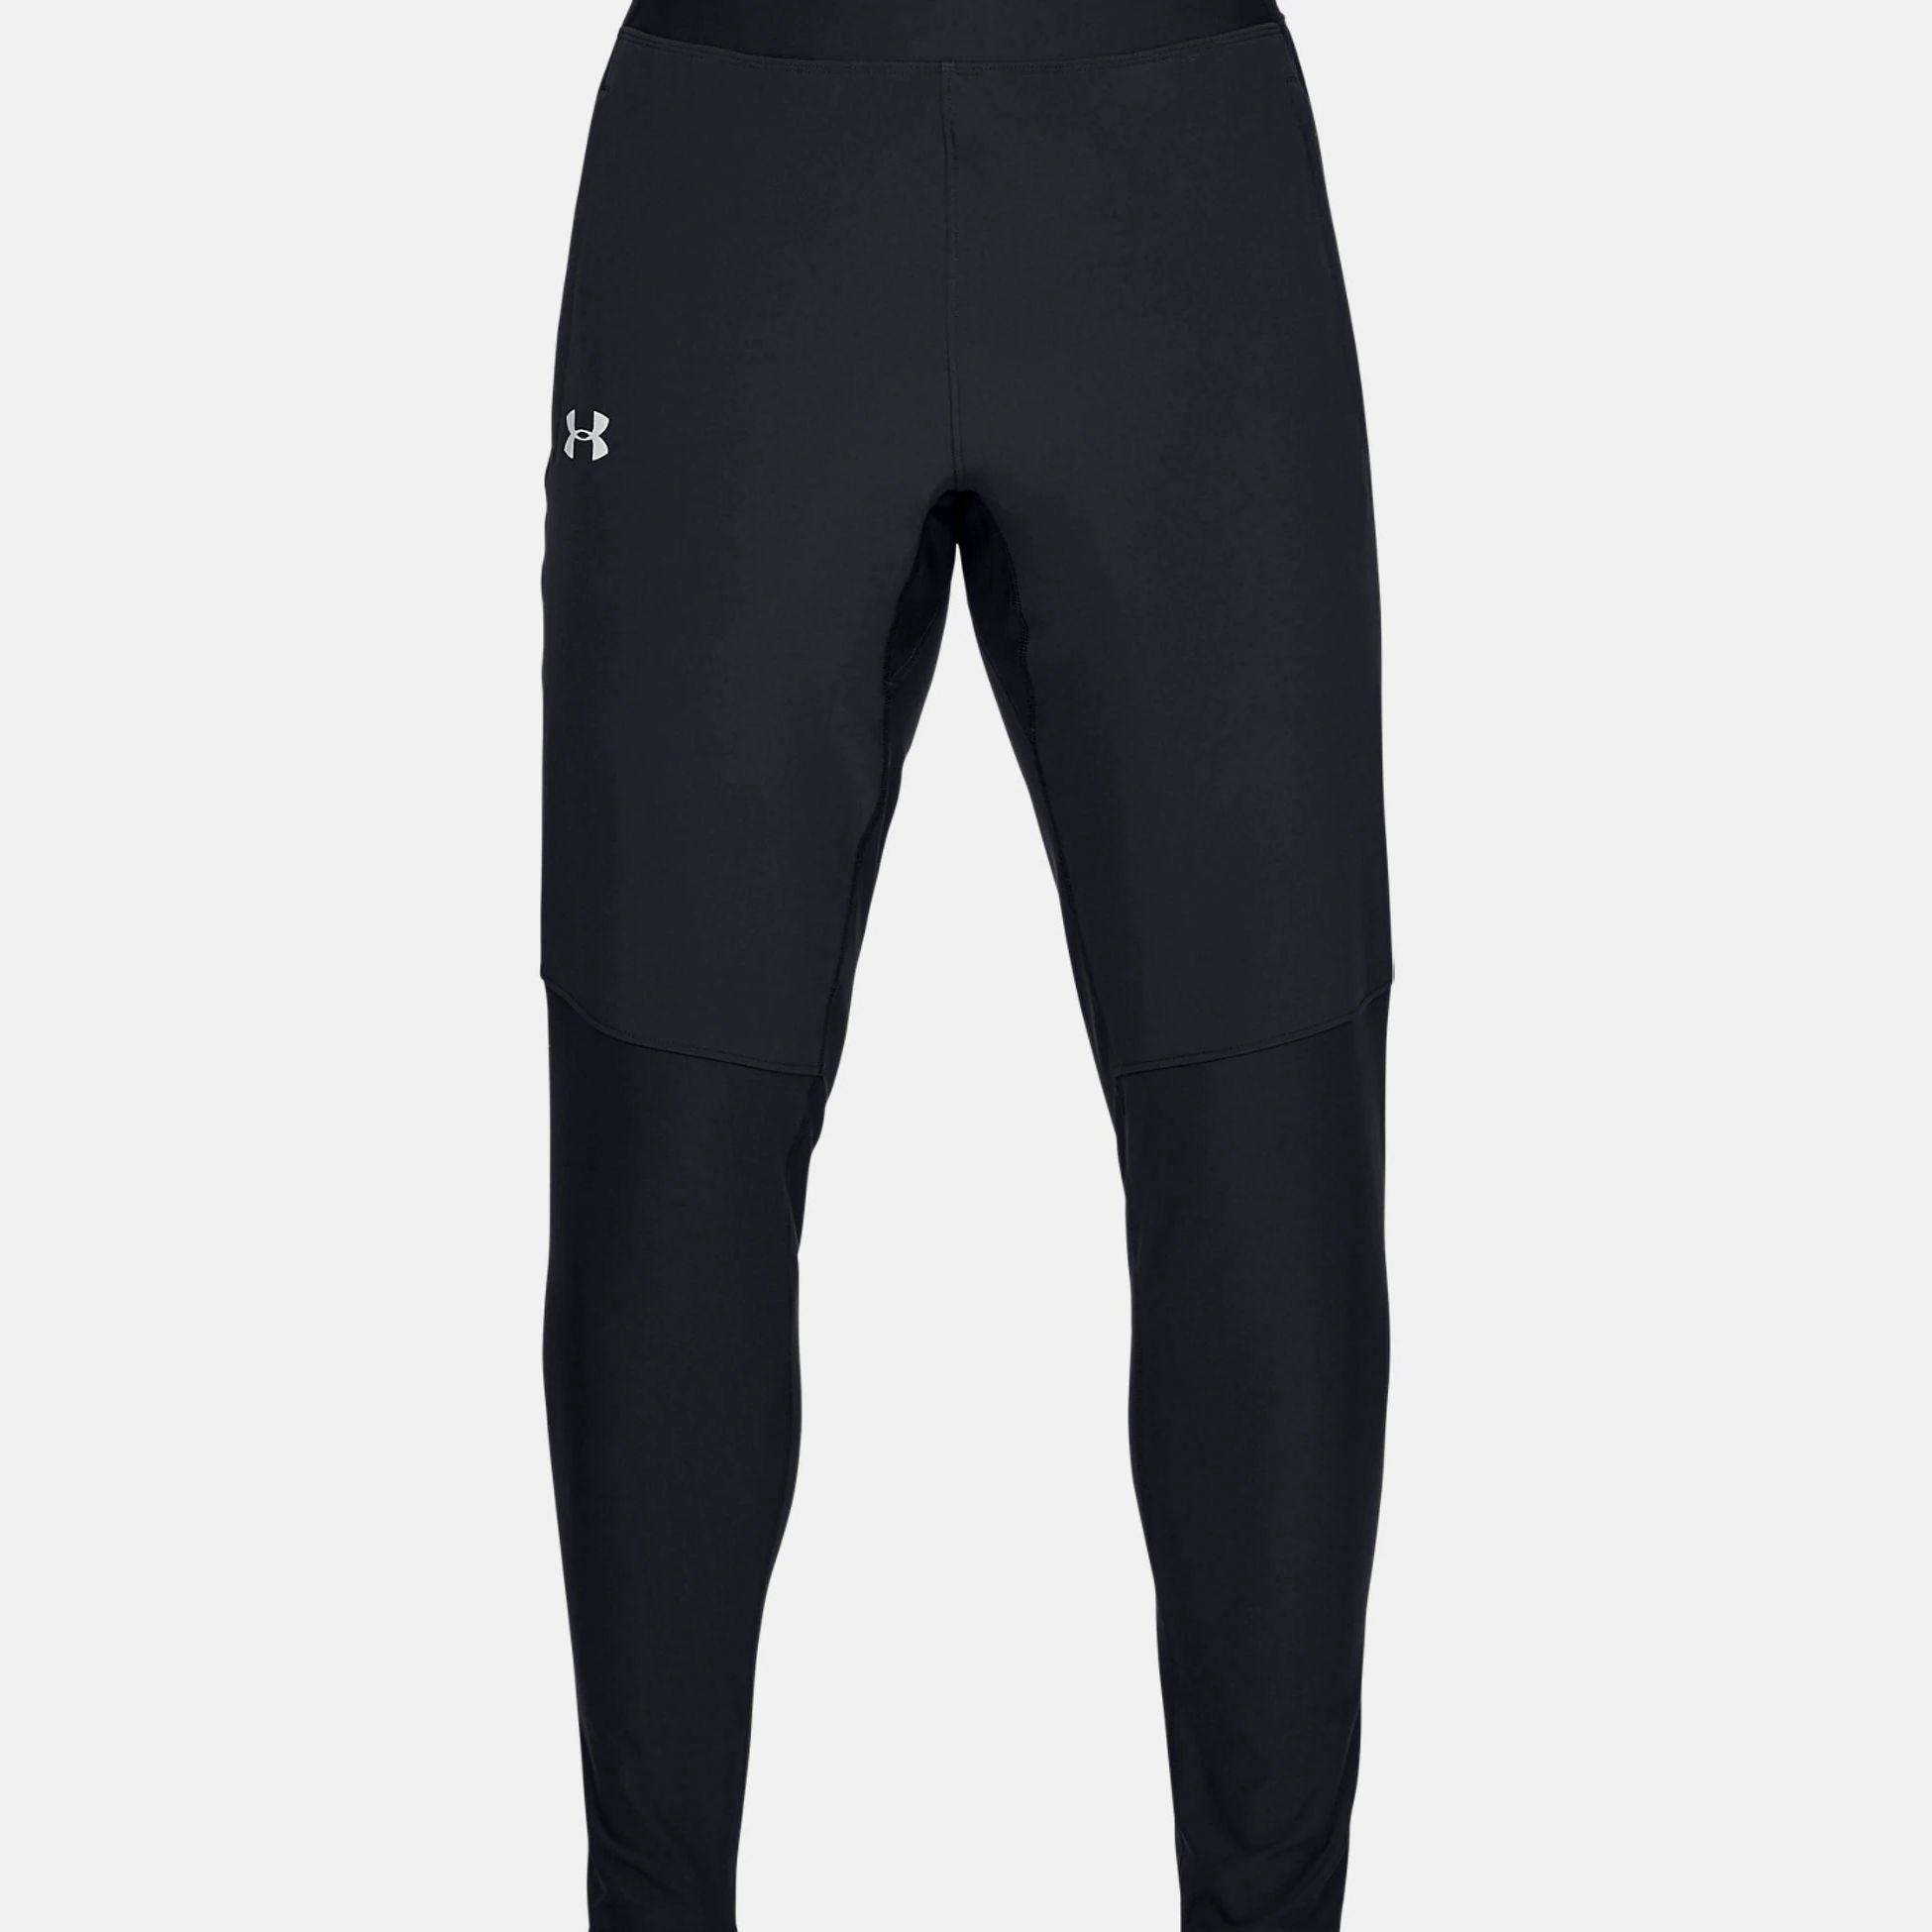 Îmbrăcăminte -  under armour UA Qualifier Speedpocket Pants 1937